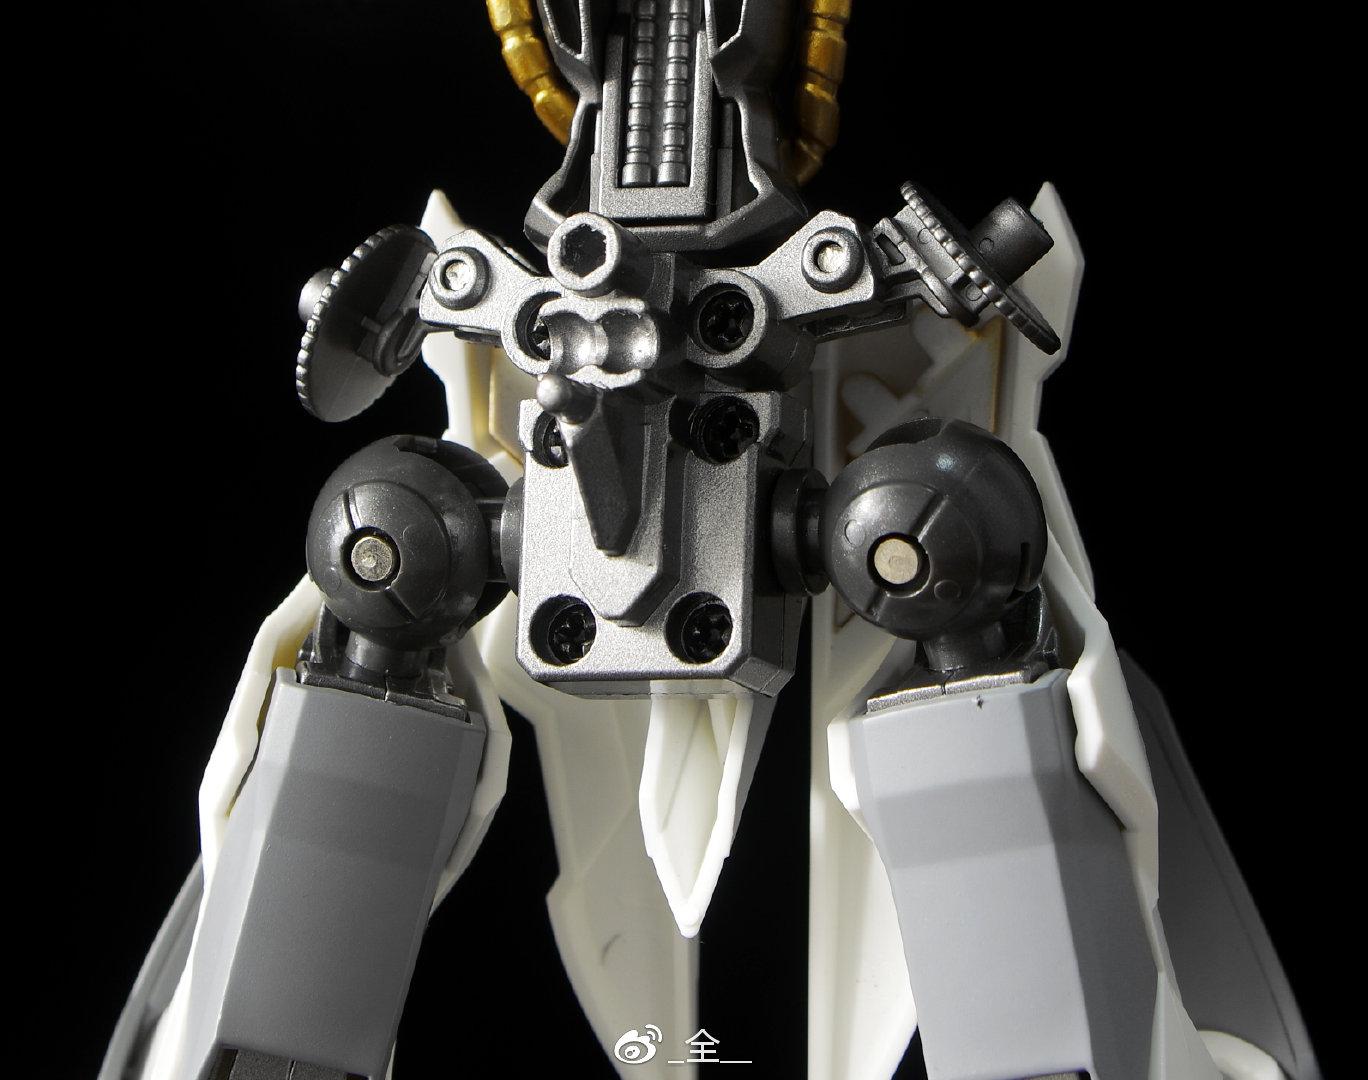 S279_MetalMyth_ryuou_inask_045.jpg